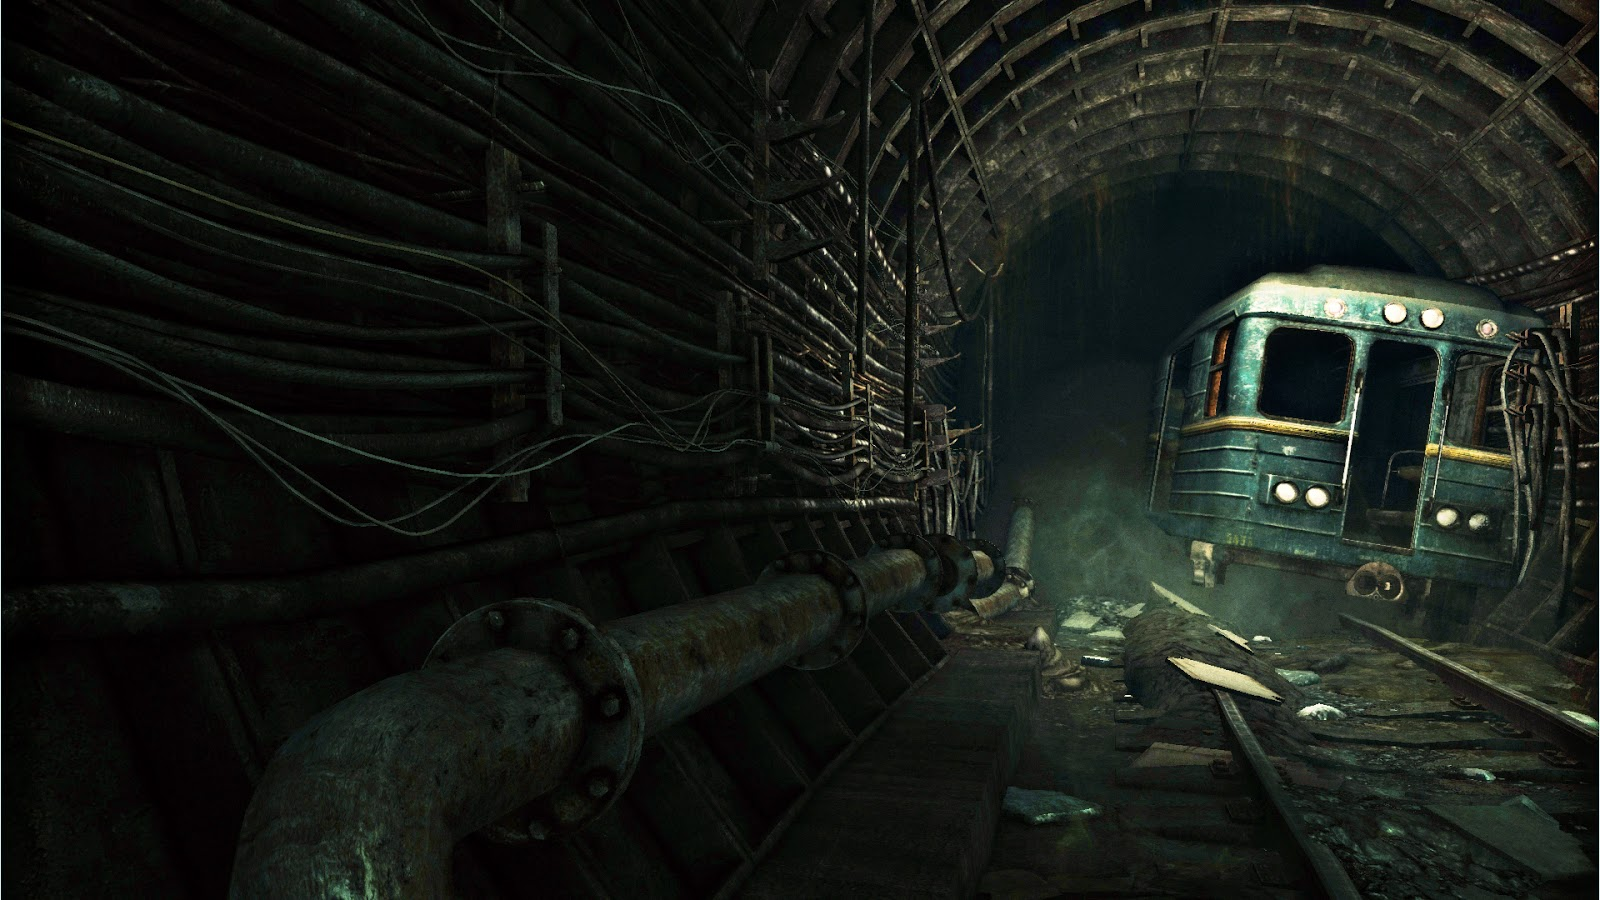 2nd Project Underground Subway Rundown Environment